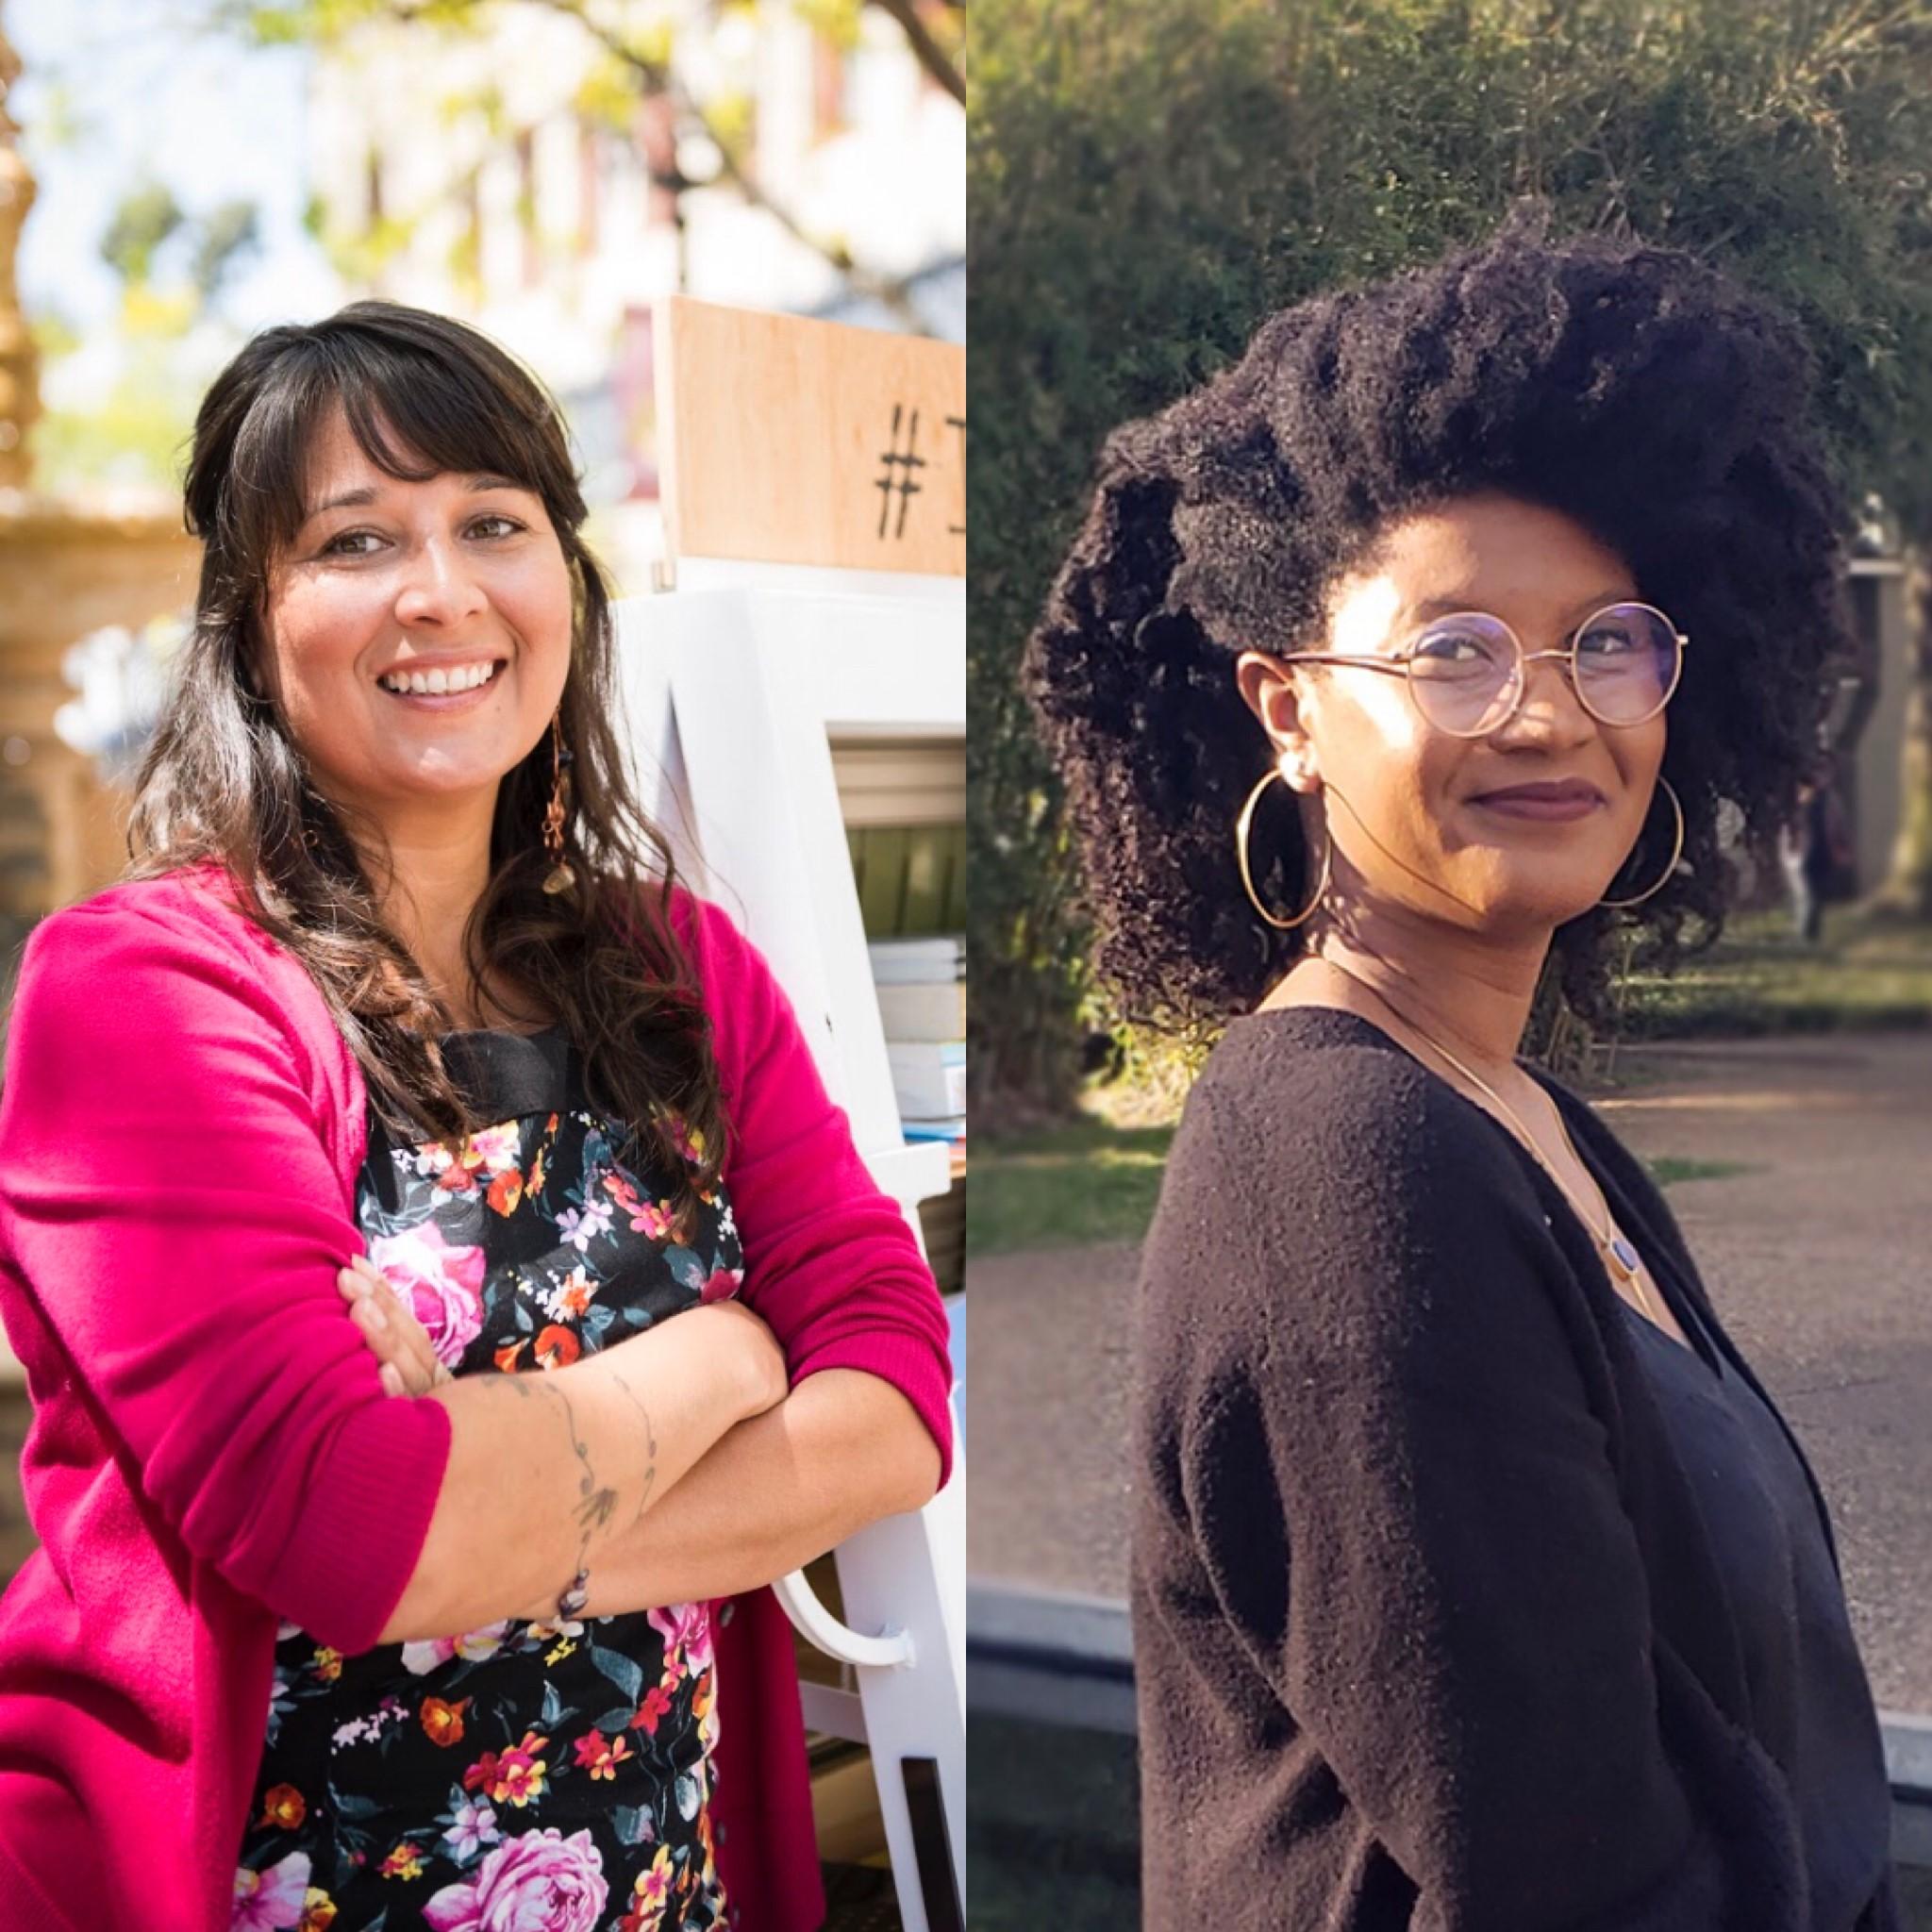 2019 KGMCA-PRH Fellows Sarah Rafael García and Libby Bland